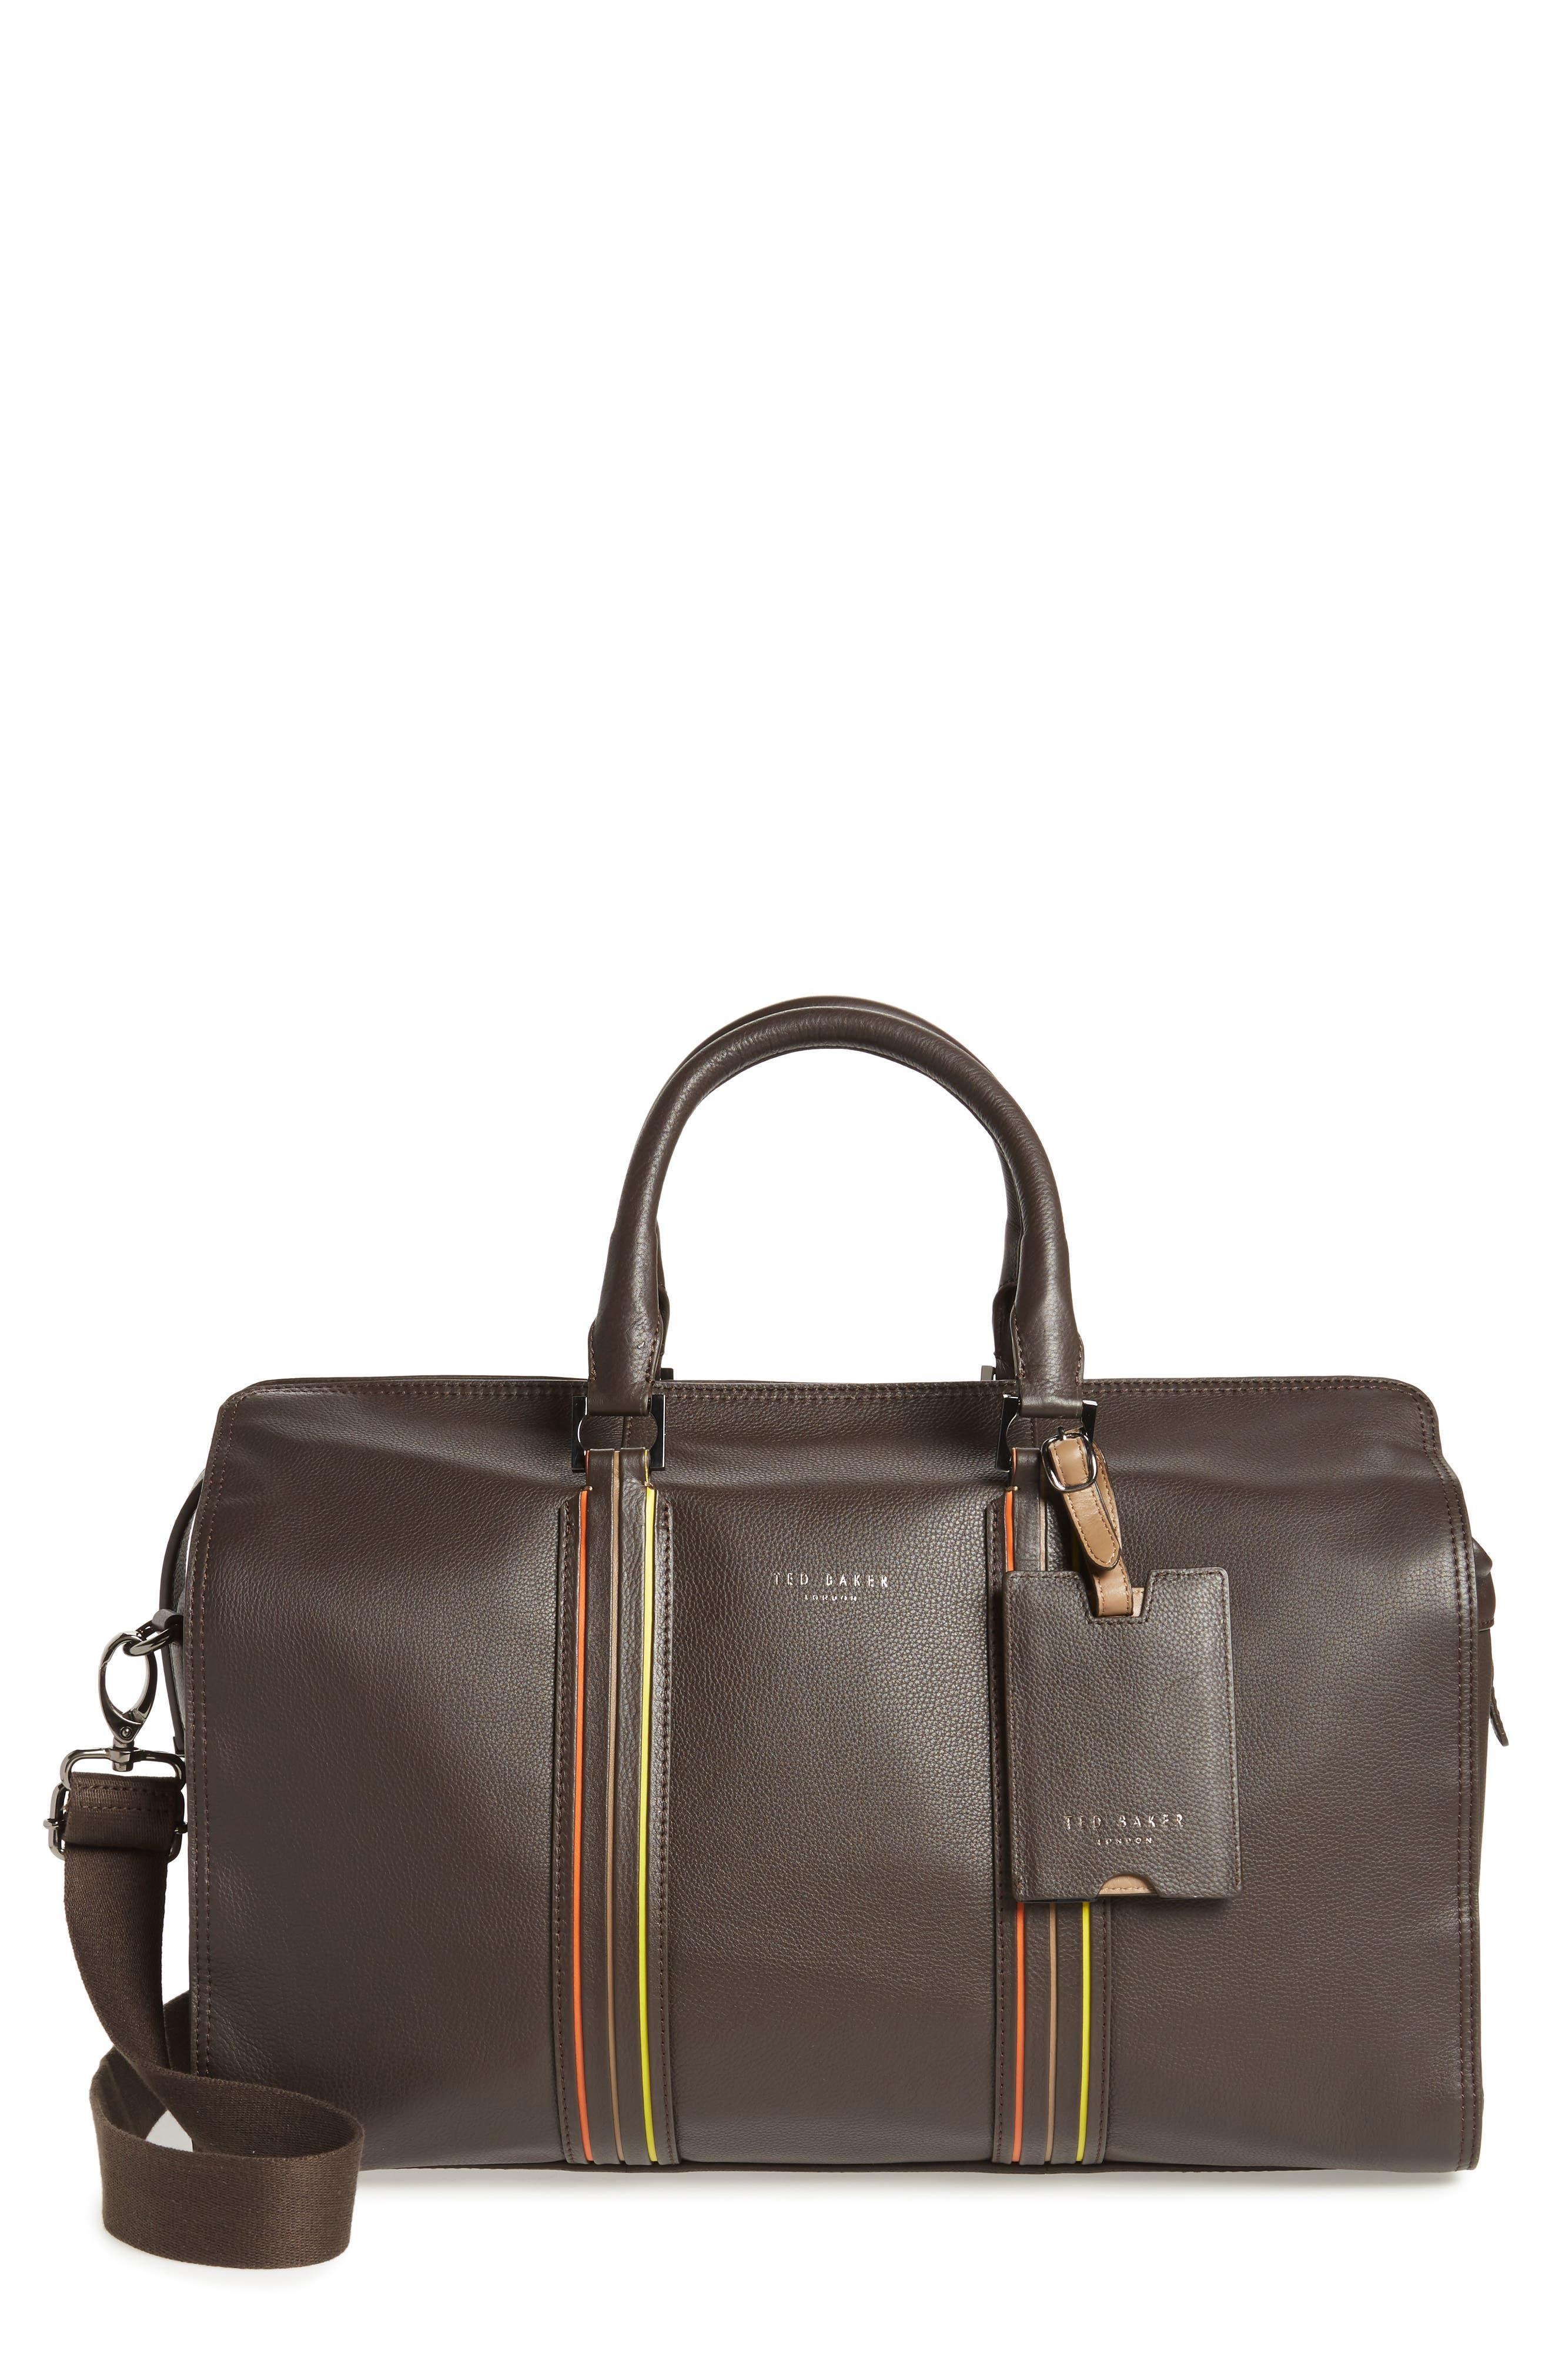 Ted Baker London Geeves Stripe Leather Duffel Bag